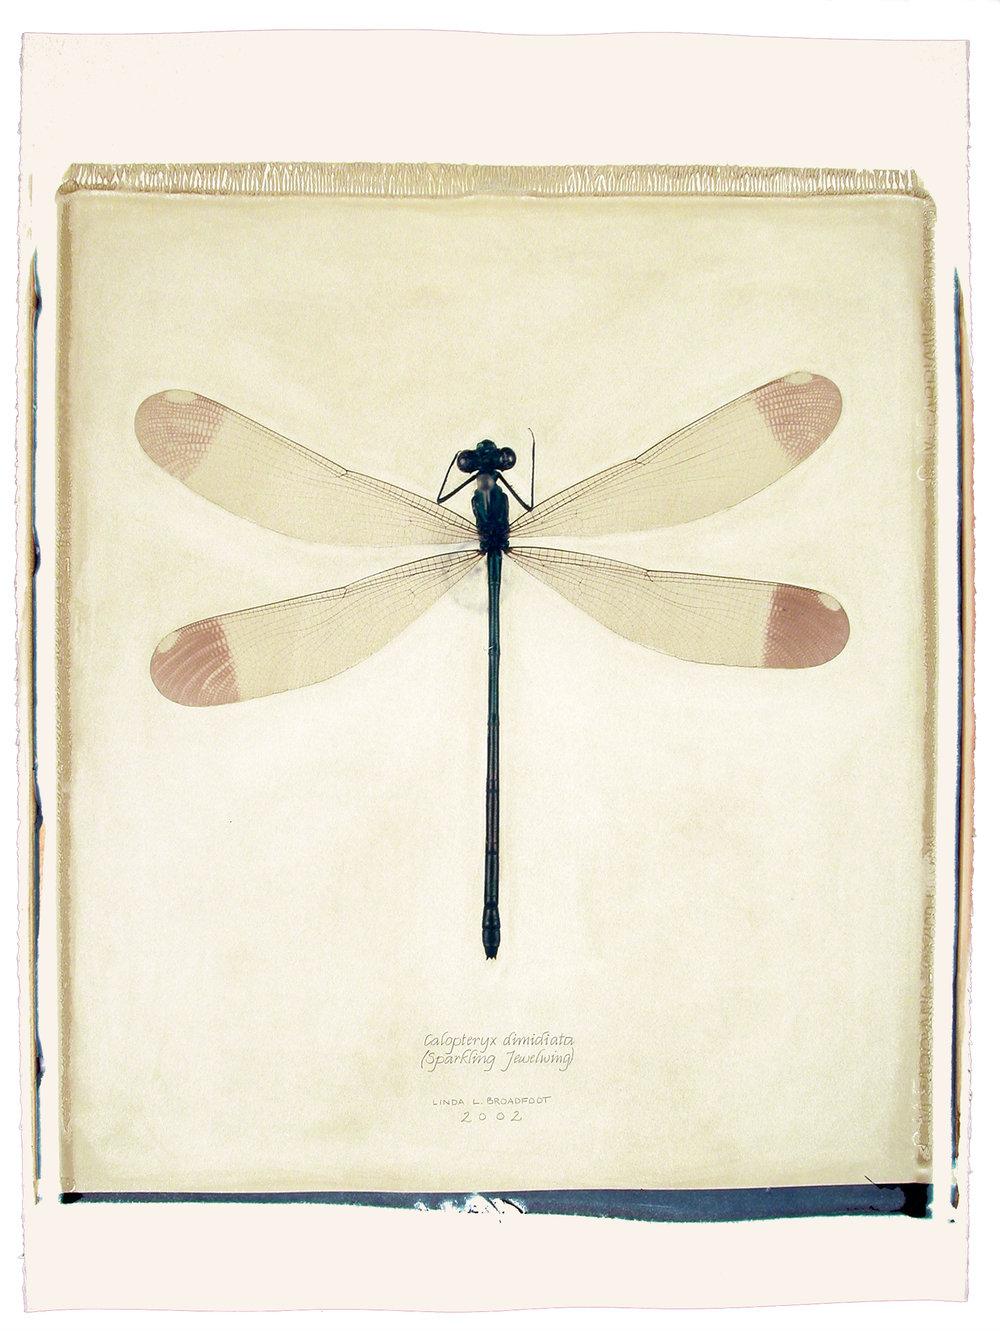 Calopteryx dimidiata  (Sparkling Jewelwing), 2002